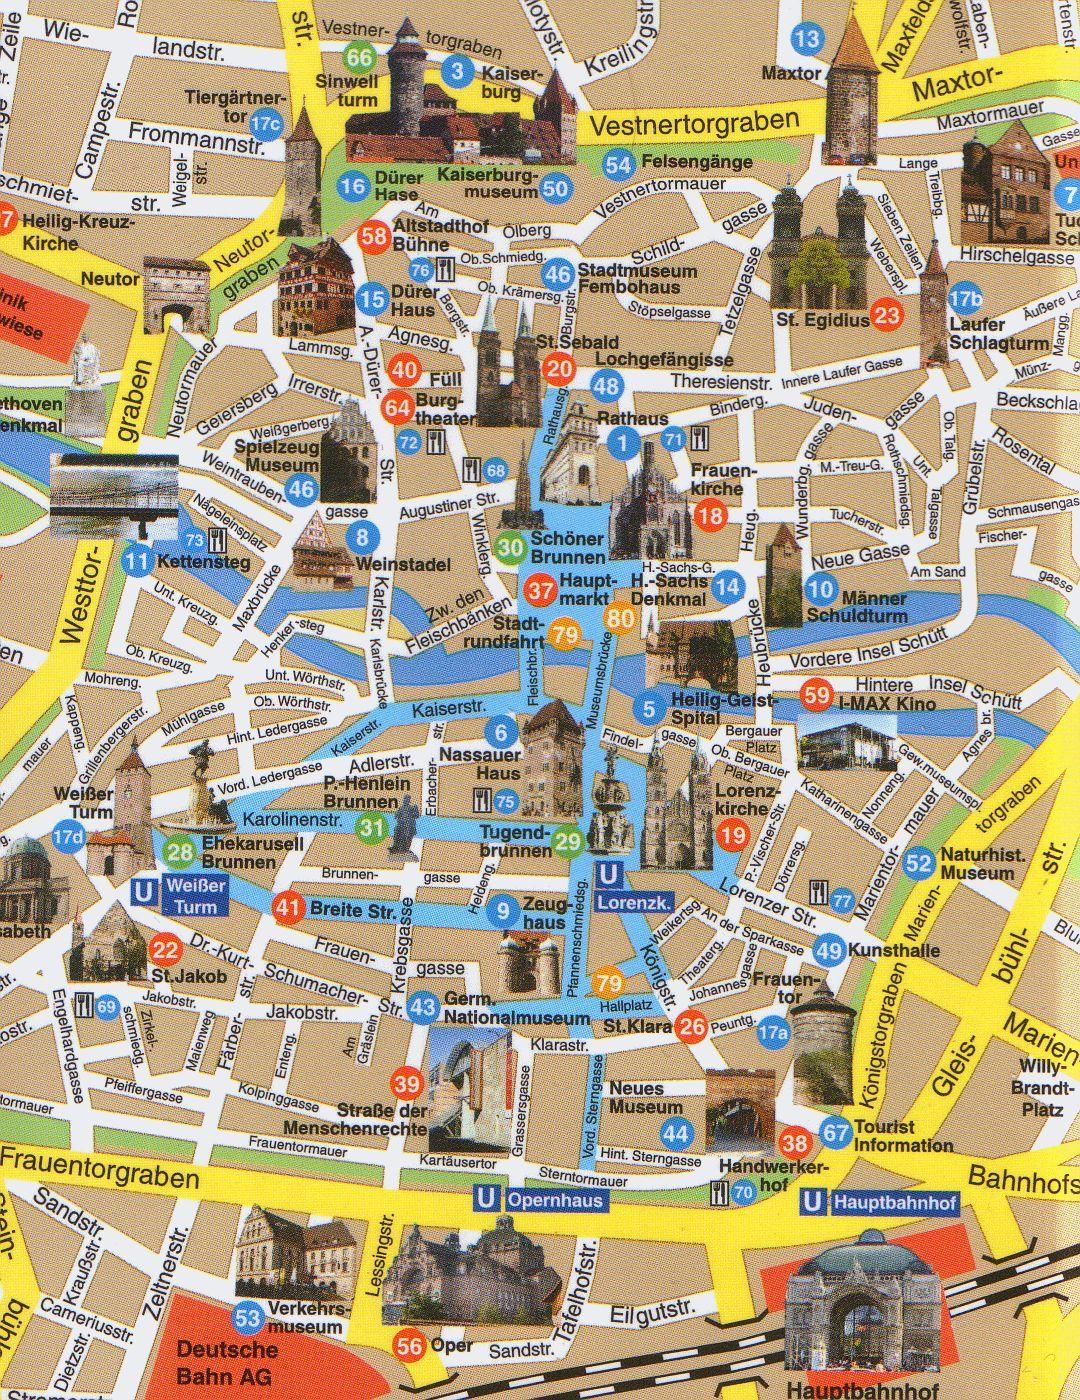 City Map Nuremberg Germany A Map To Get Around Nuremberg